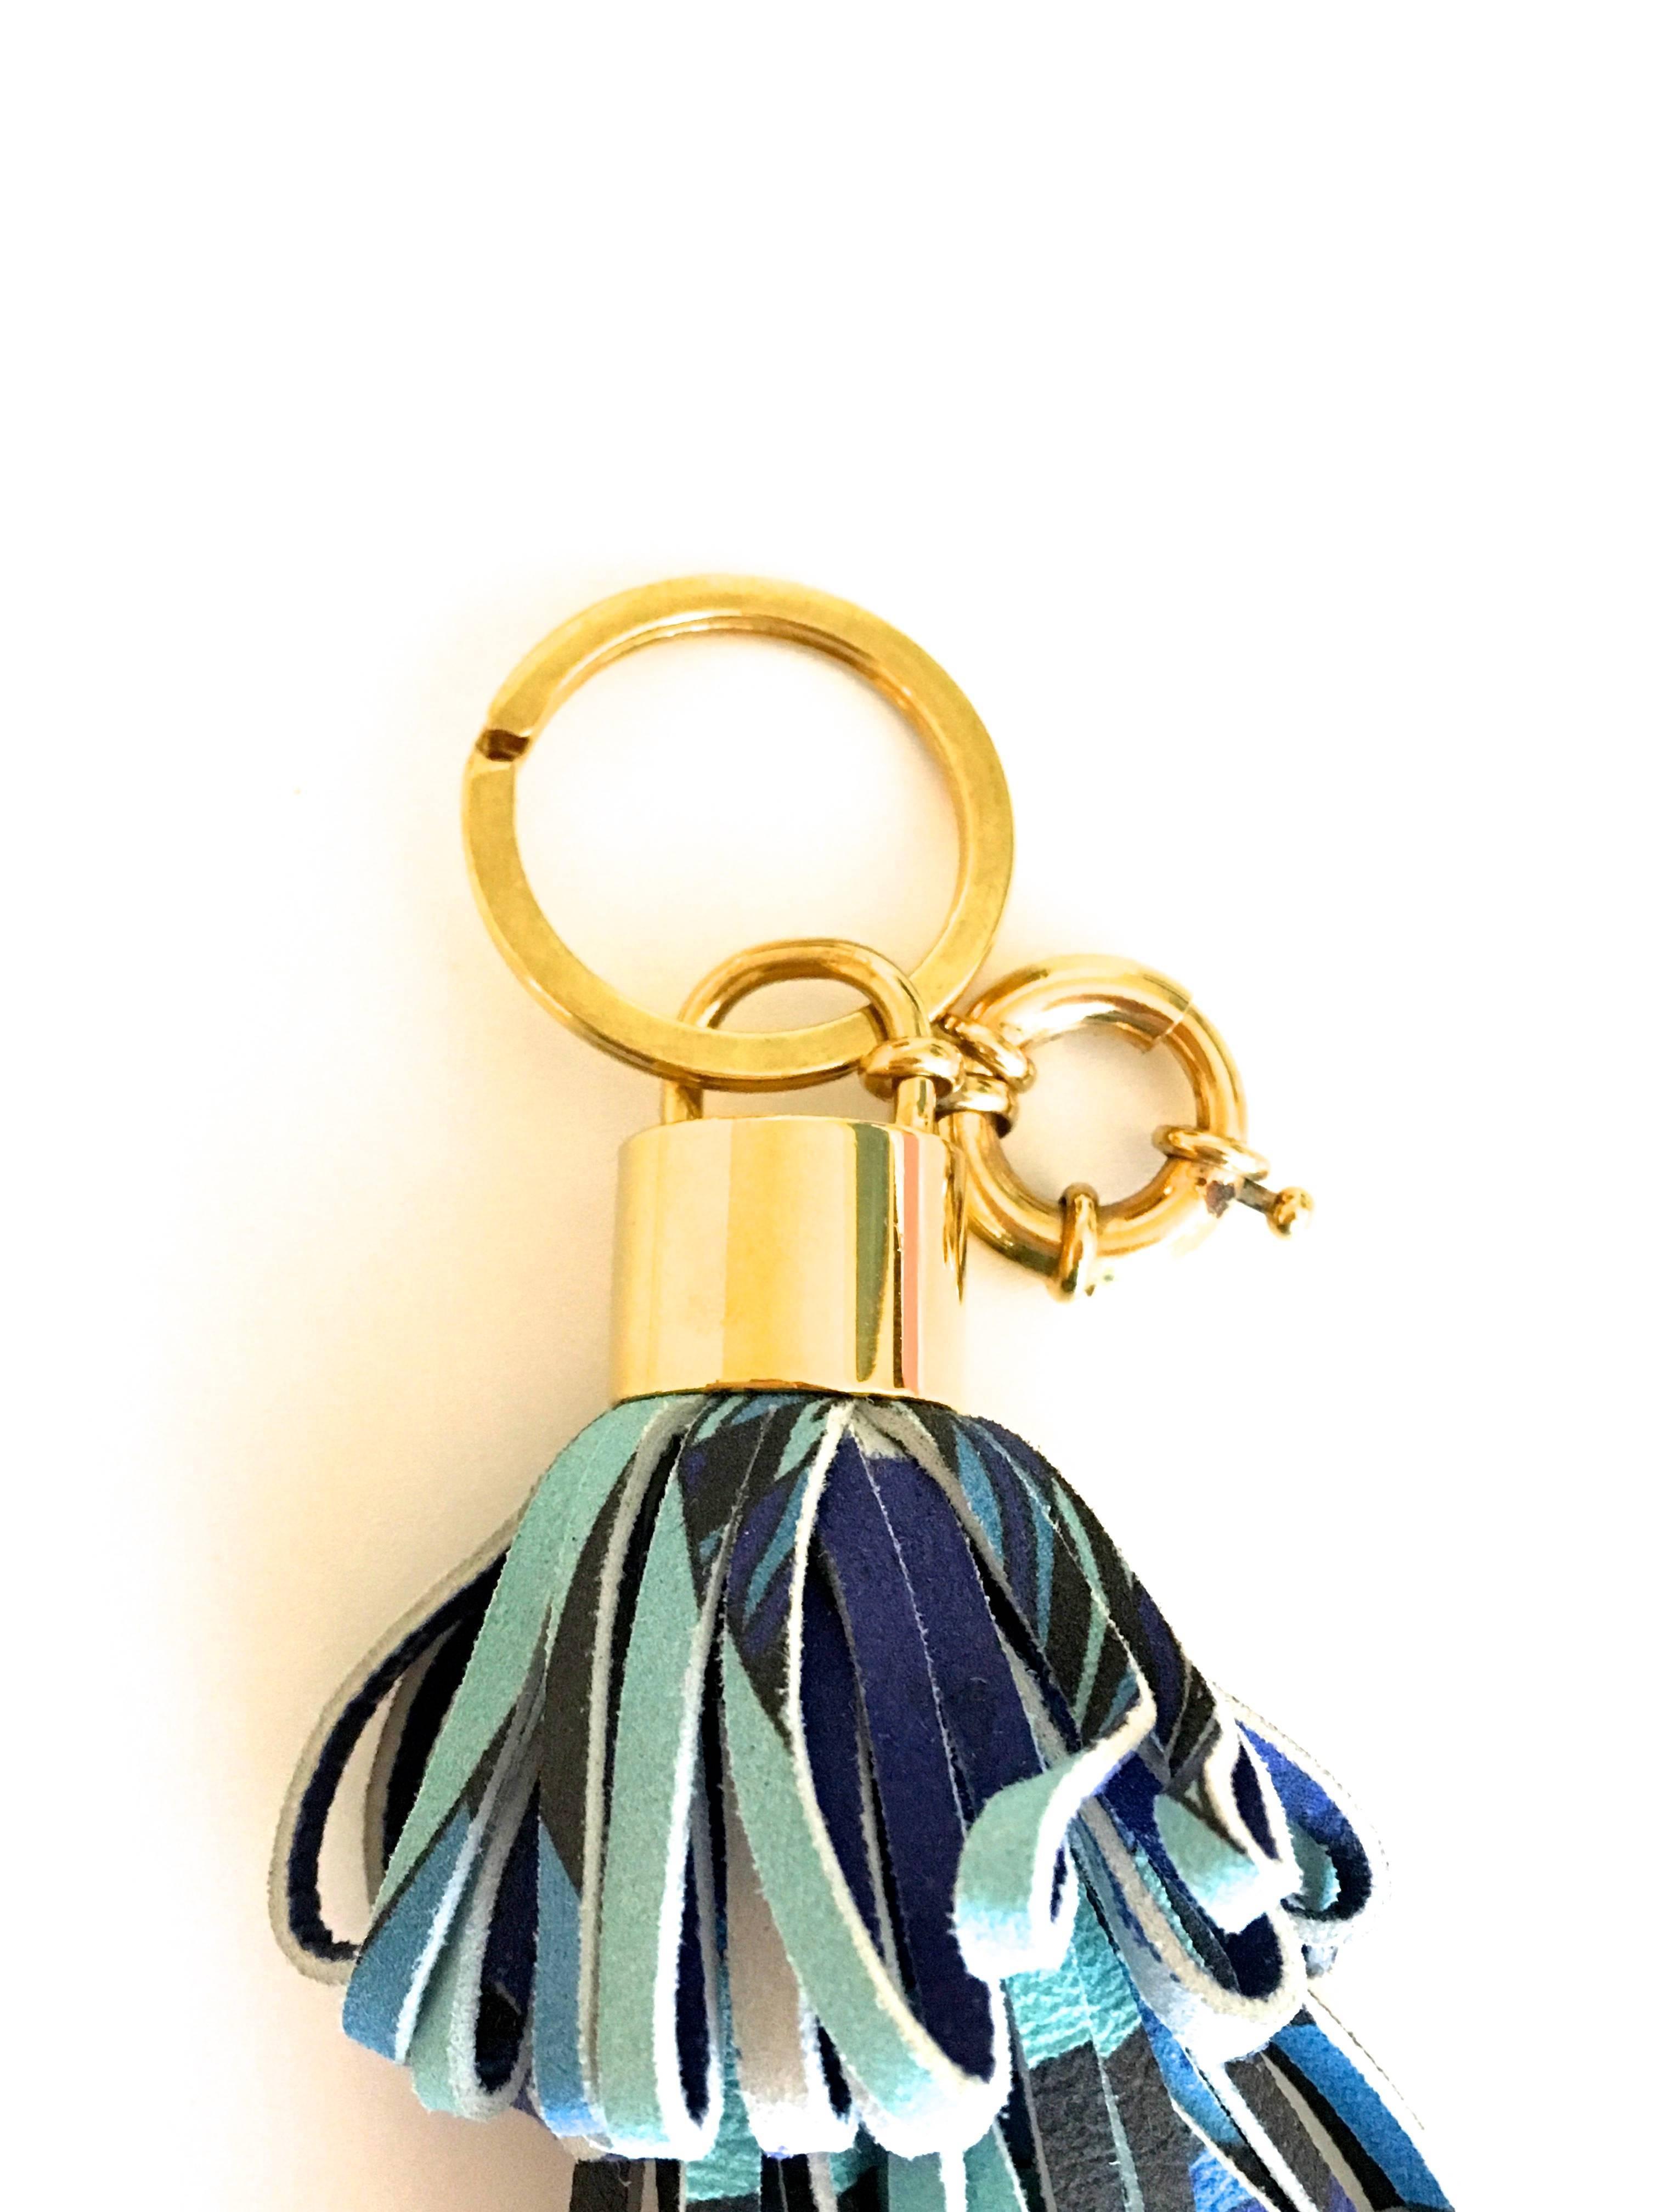 Emilio Pucci Bag Charm / Keychain - Rare wZXxRL